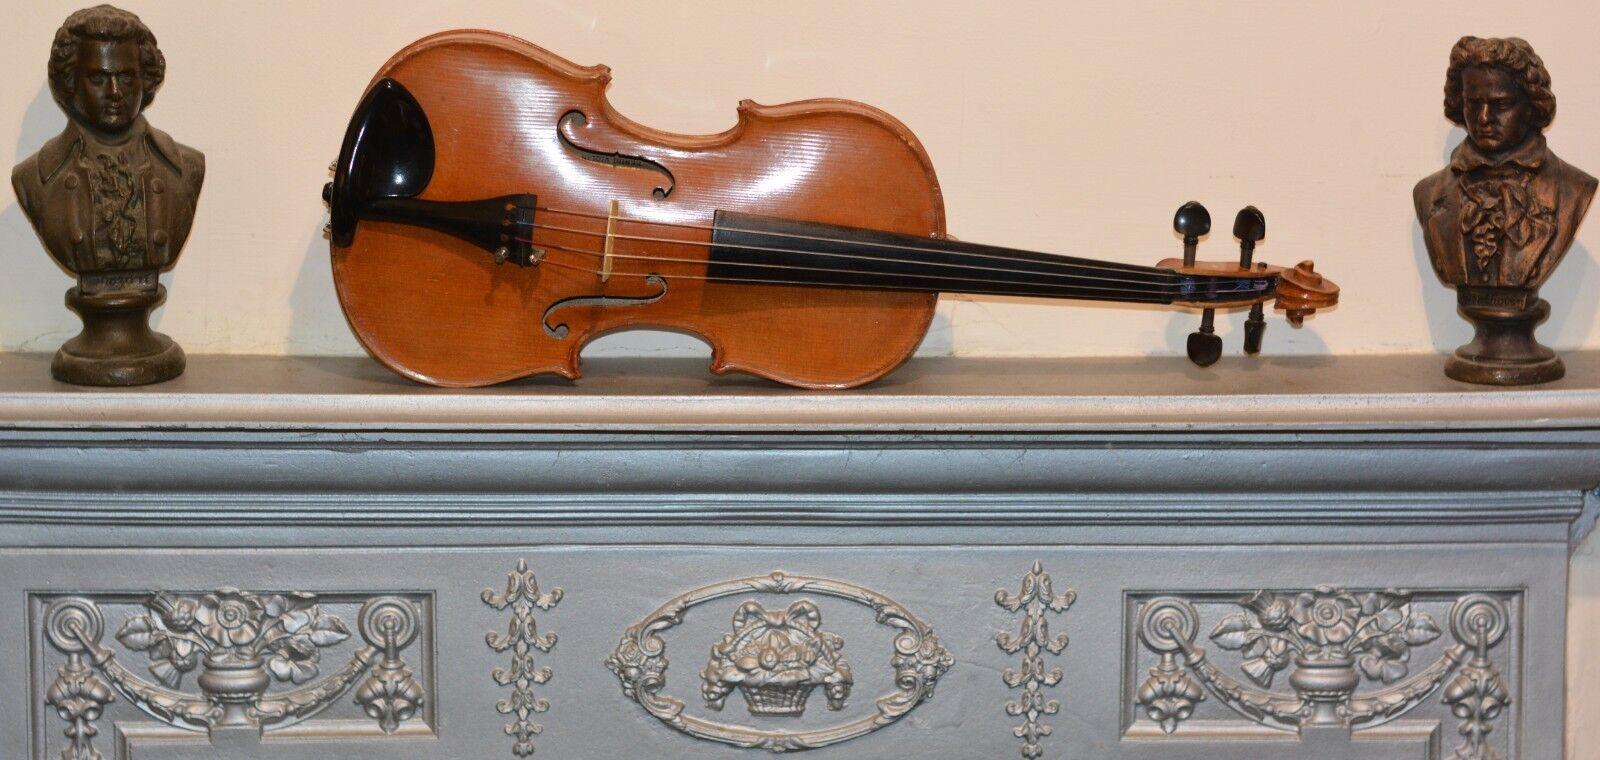 Vintage 4/4 violin by Marcus Berini + 925 bow + Case